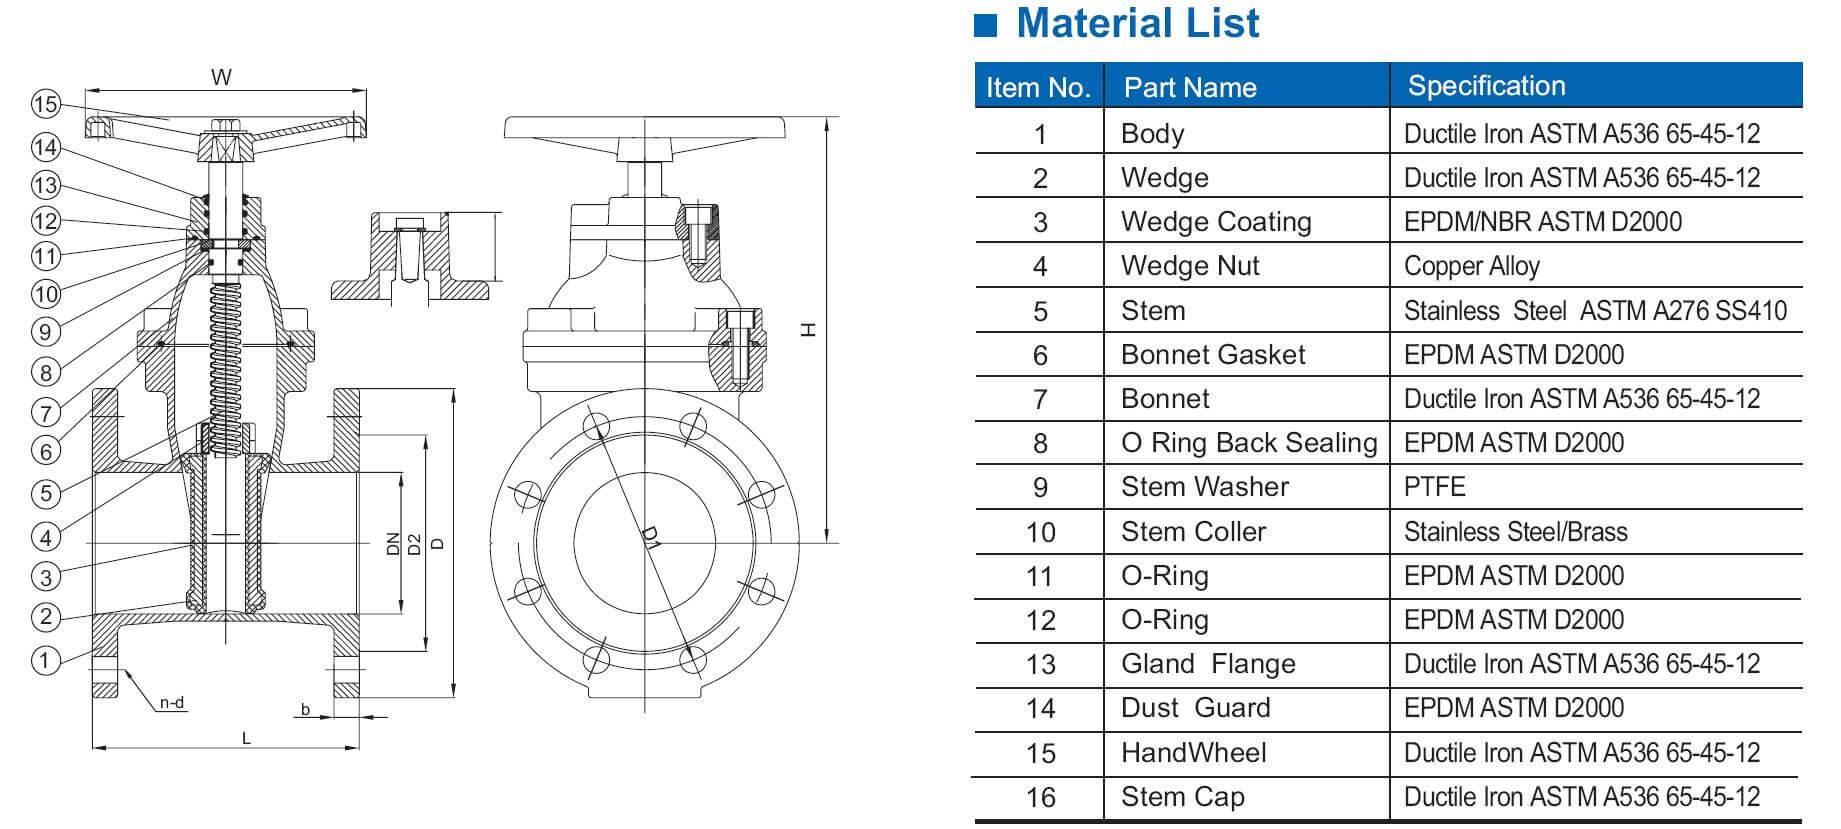 AWWA C509 reslient seat gate valve